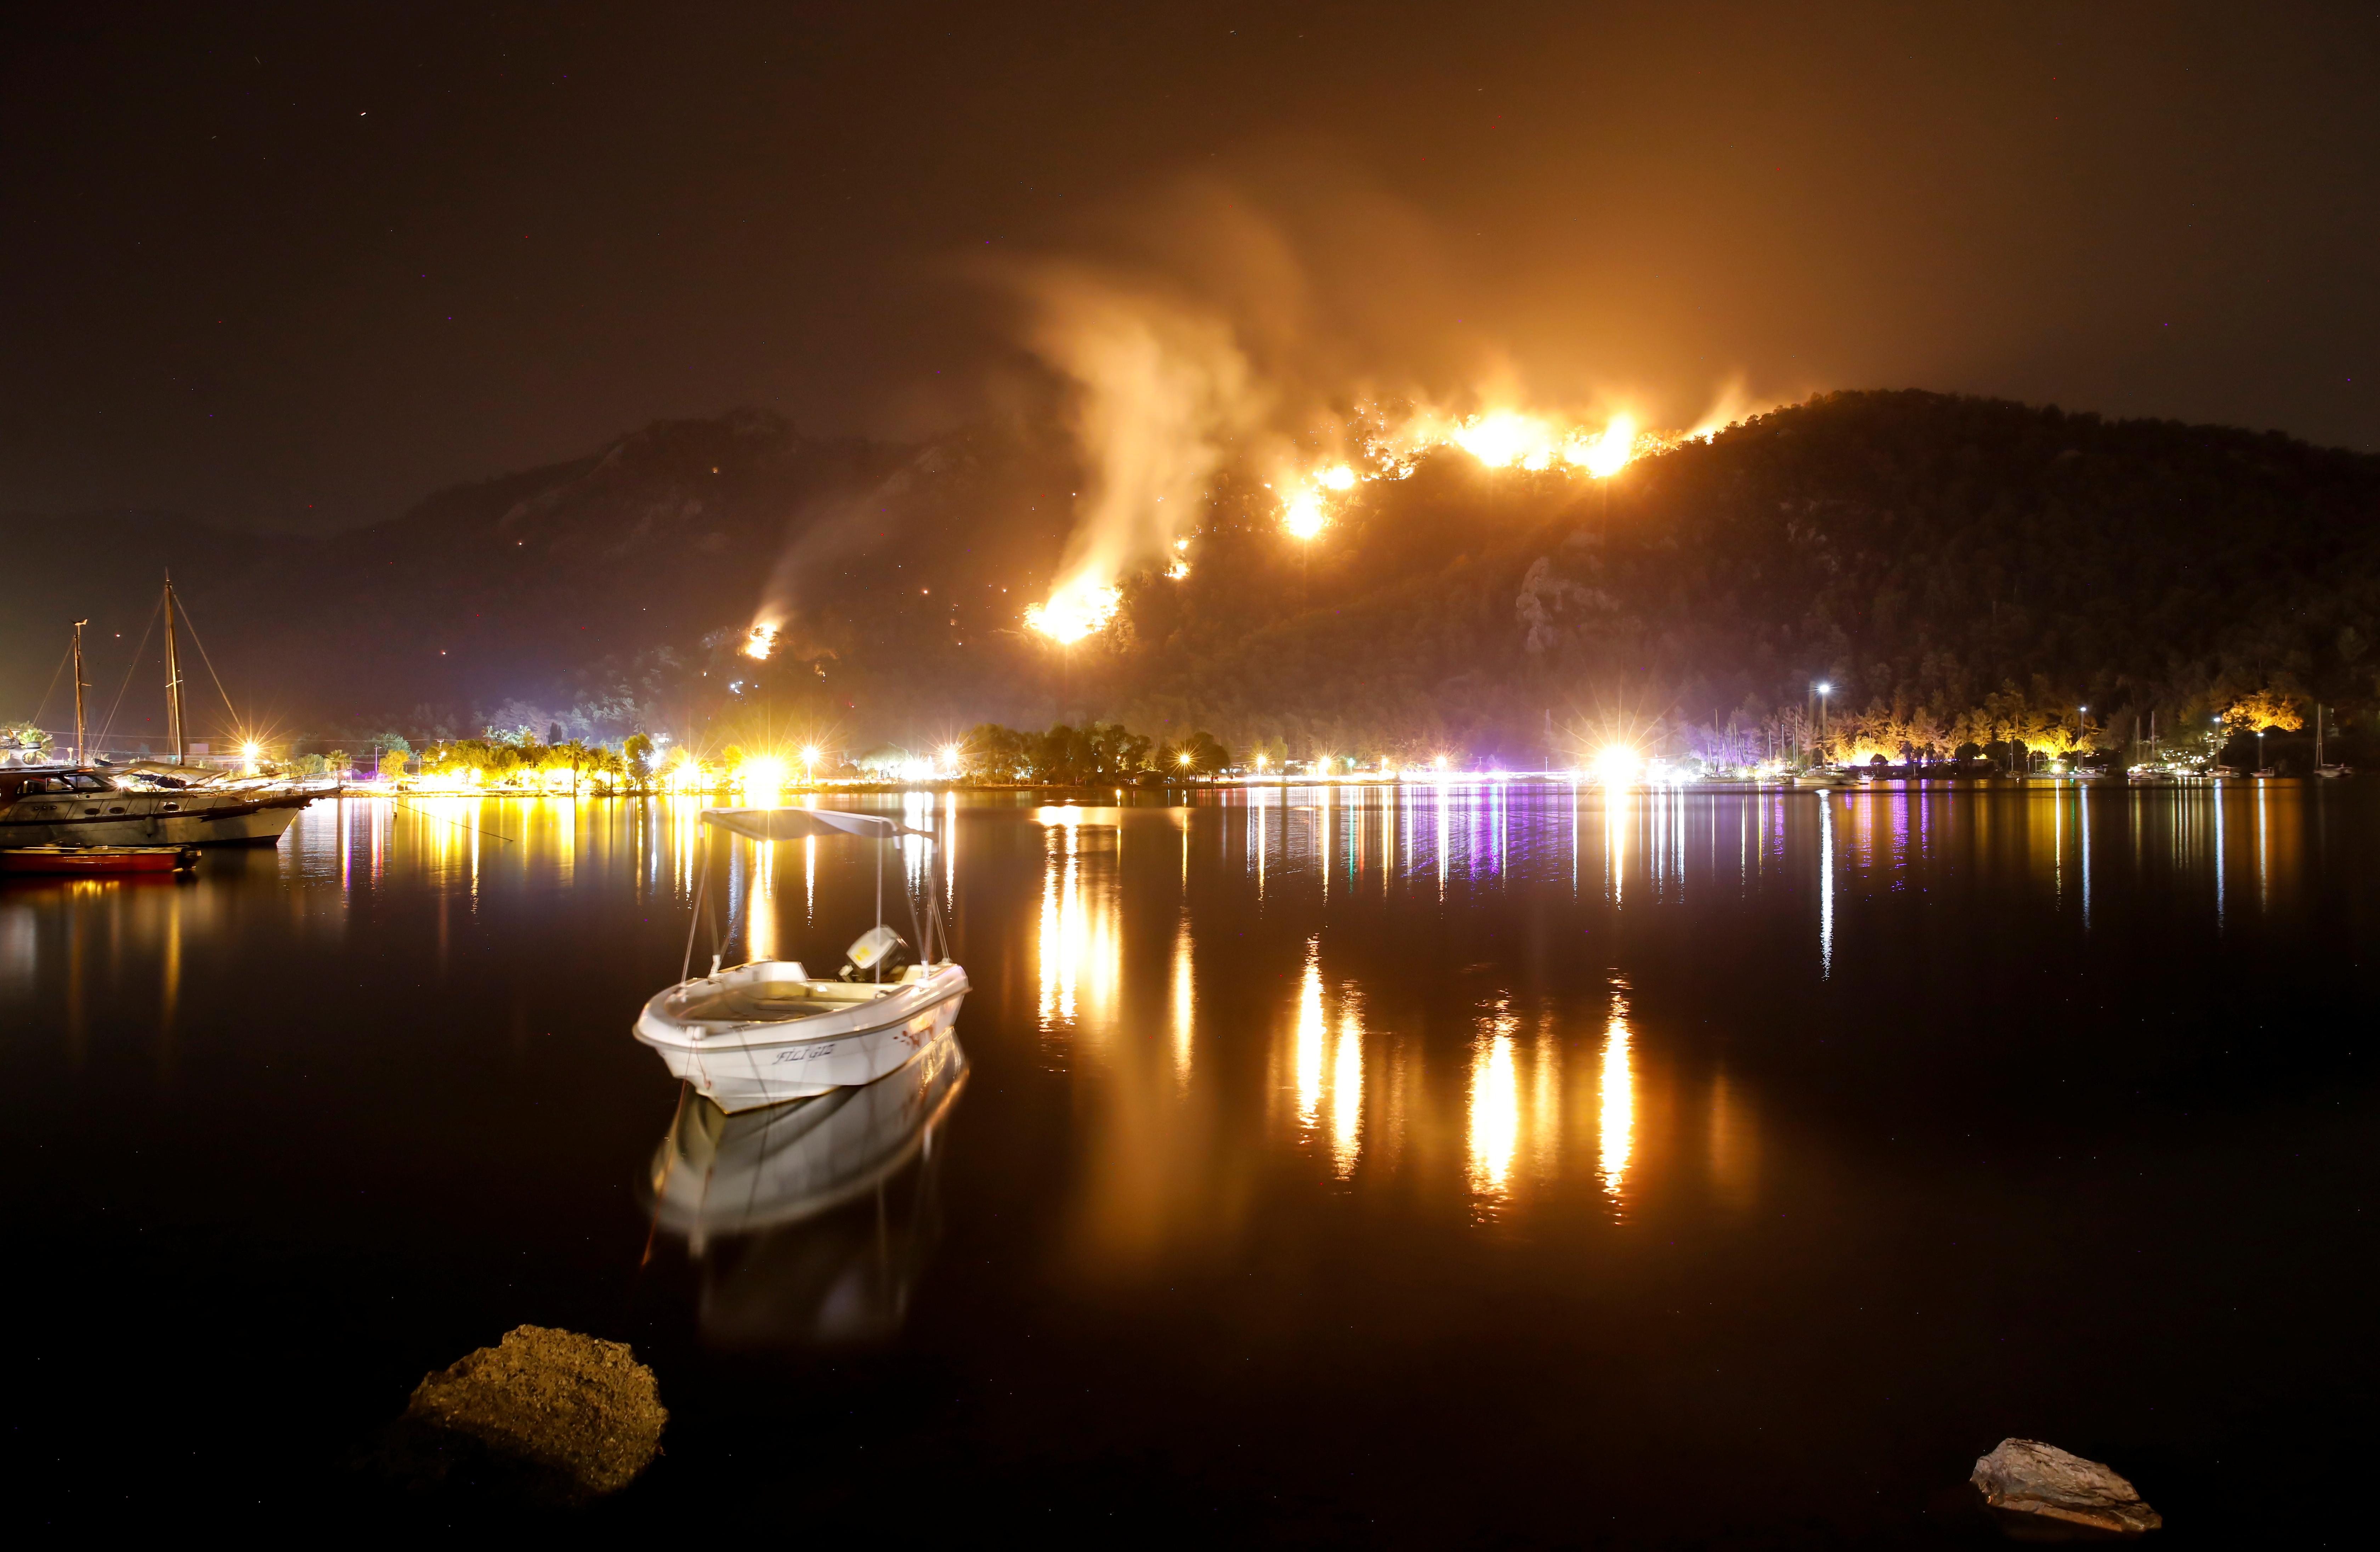 Flames and smoke rises from mountains in Orhaniye village near Marmaris, Turkey, August 4, 2021. REUTERS/Umit Bektas